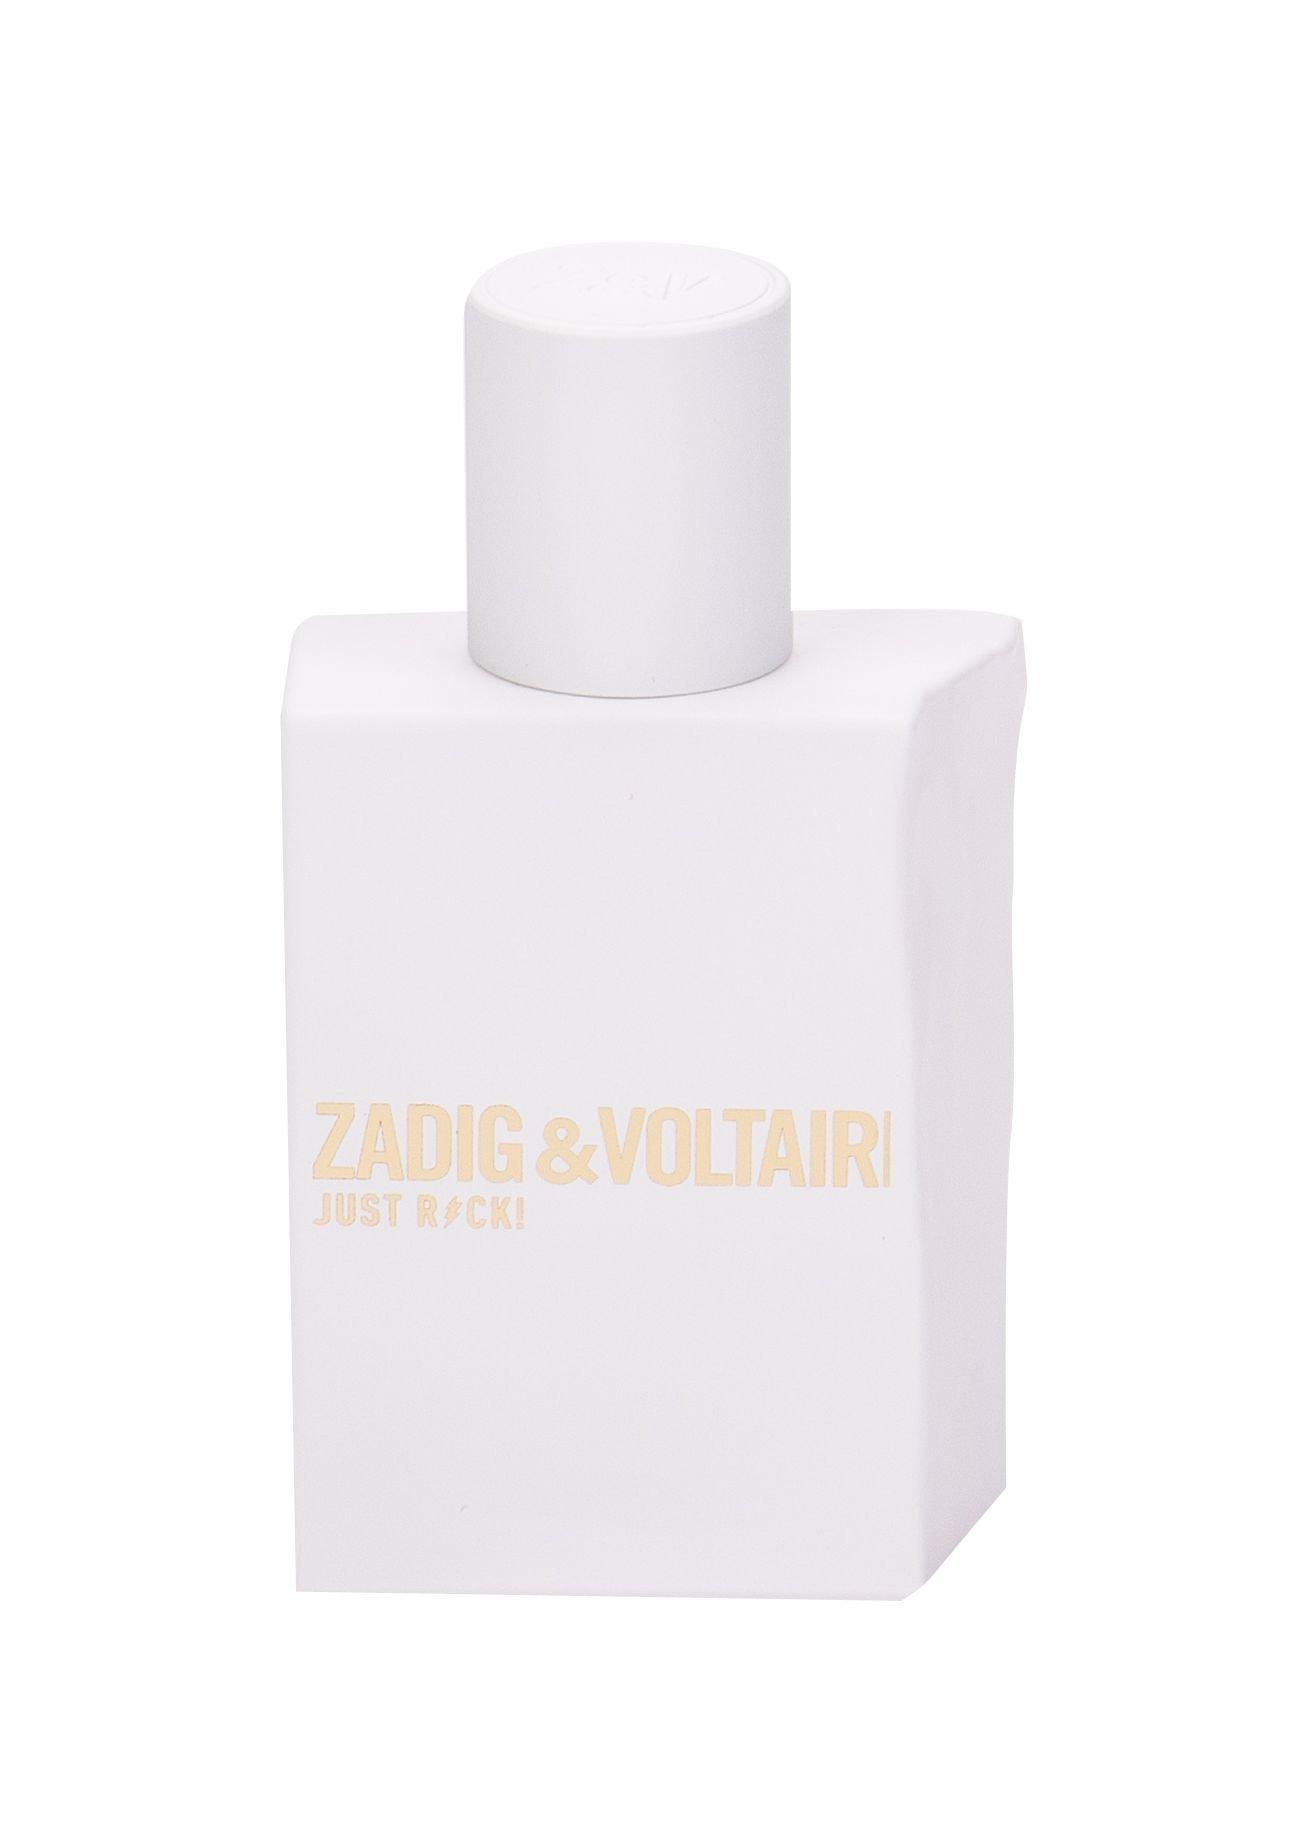 Zadig & Voltaire Just Rock! Eau de Parfum 30ml